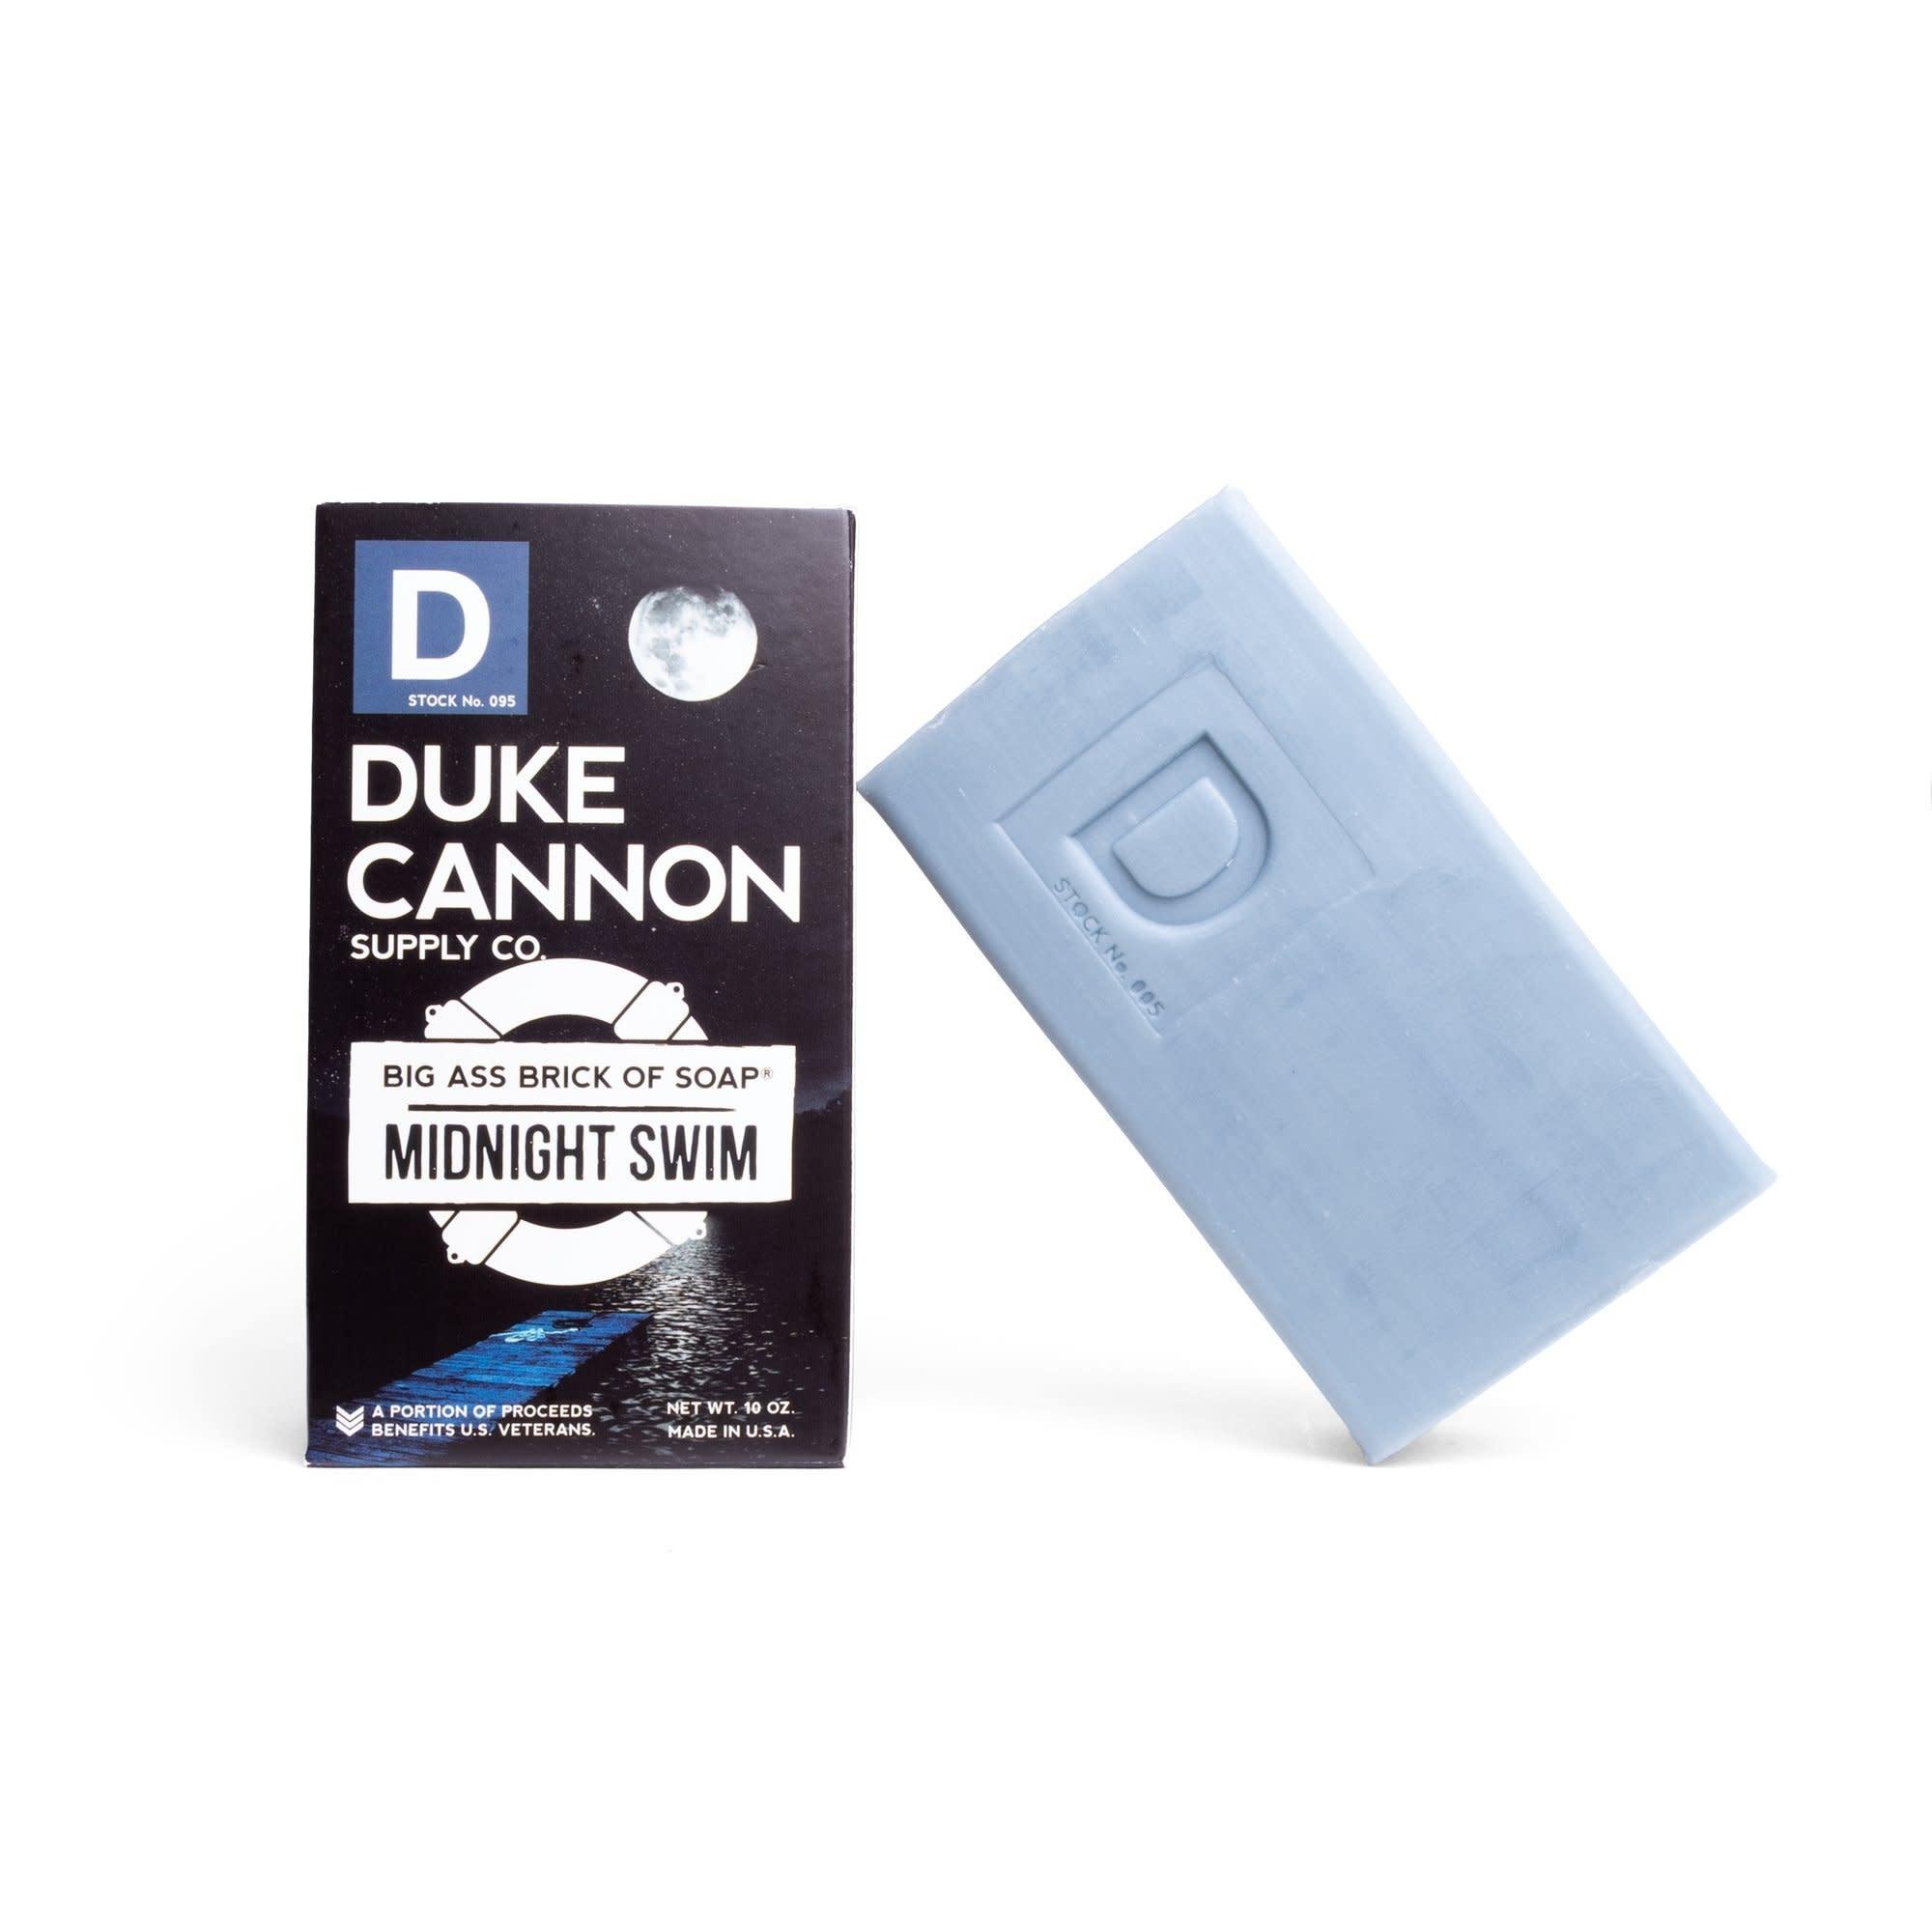 Duke Cannon Midnight Swim Big Ass Brick of Soap